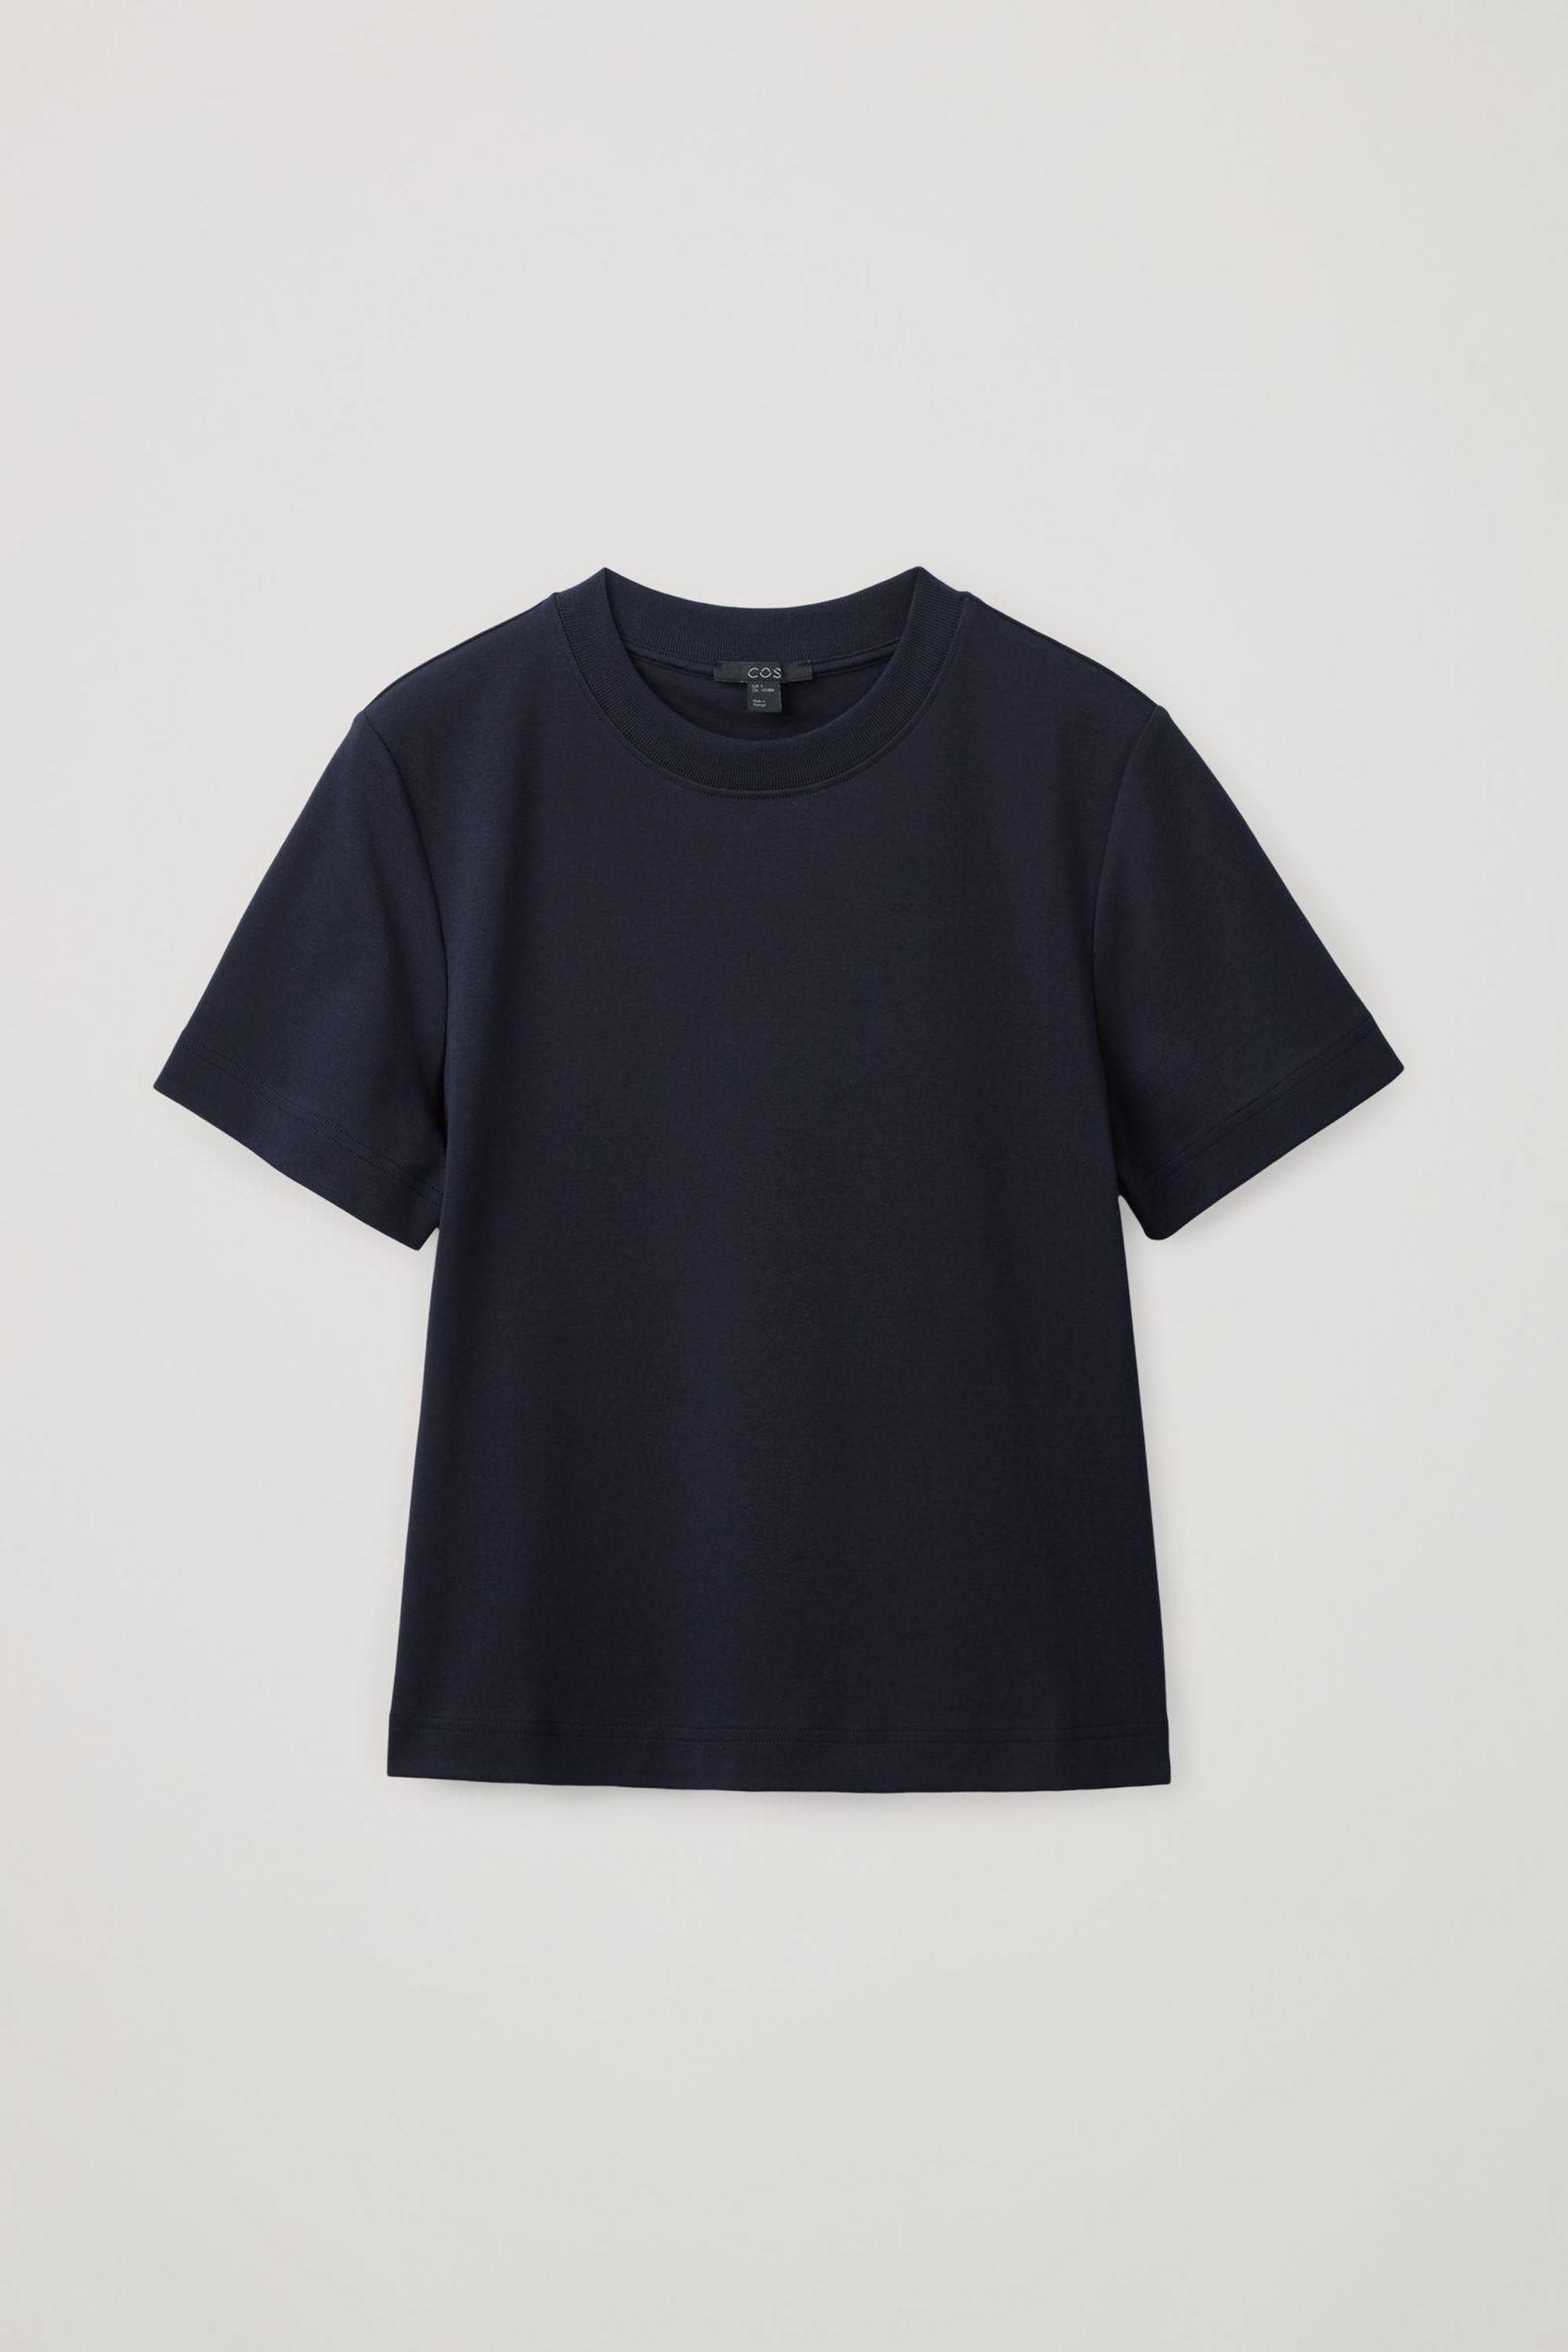 COS 슬림 핏 티셔츠의 블루컬러 Product입니다.